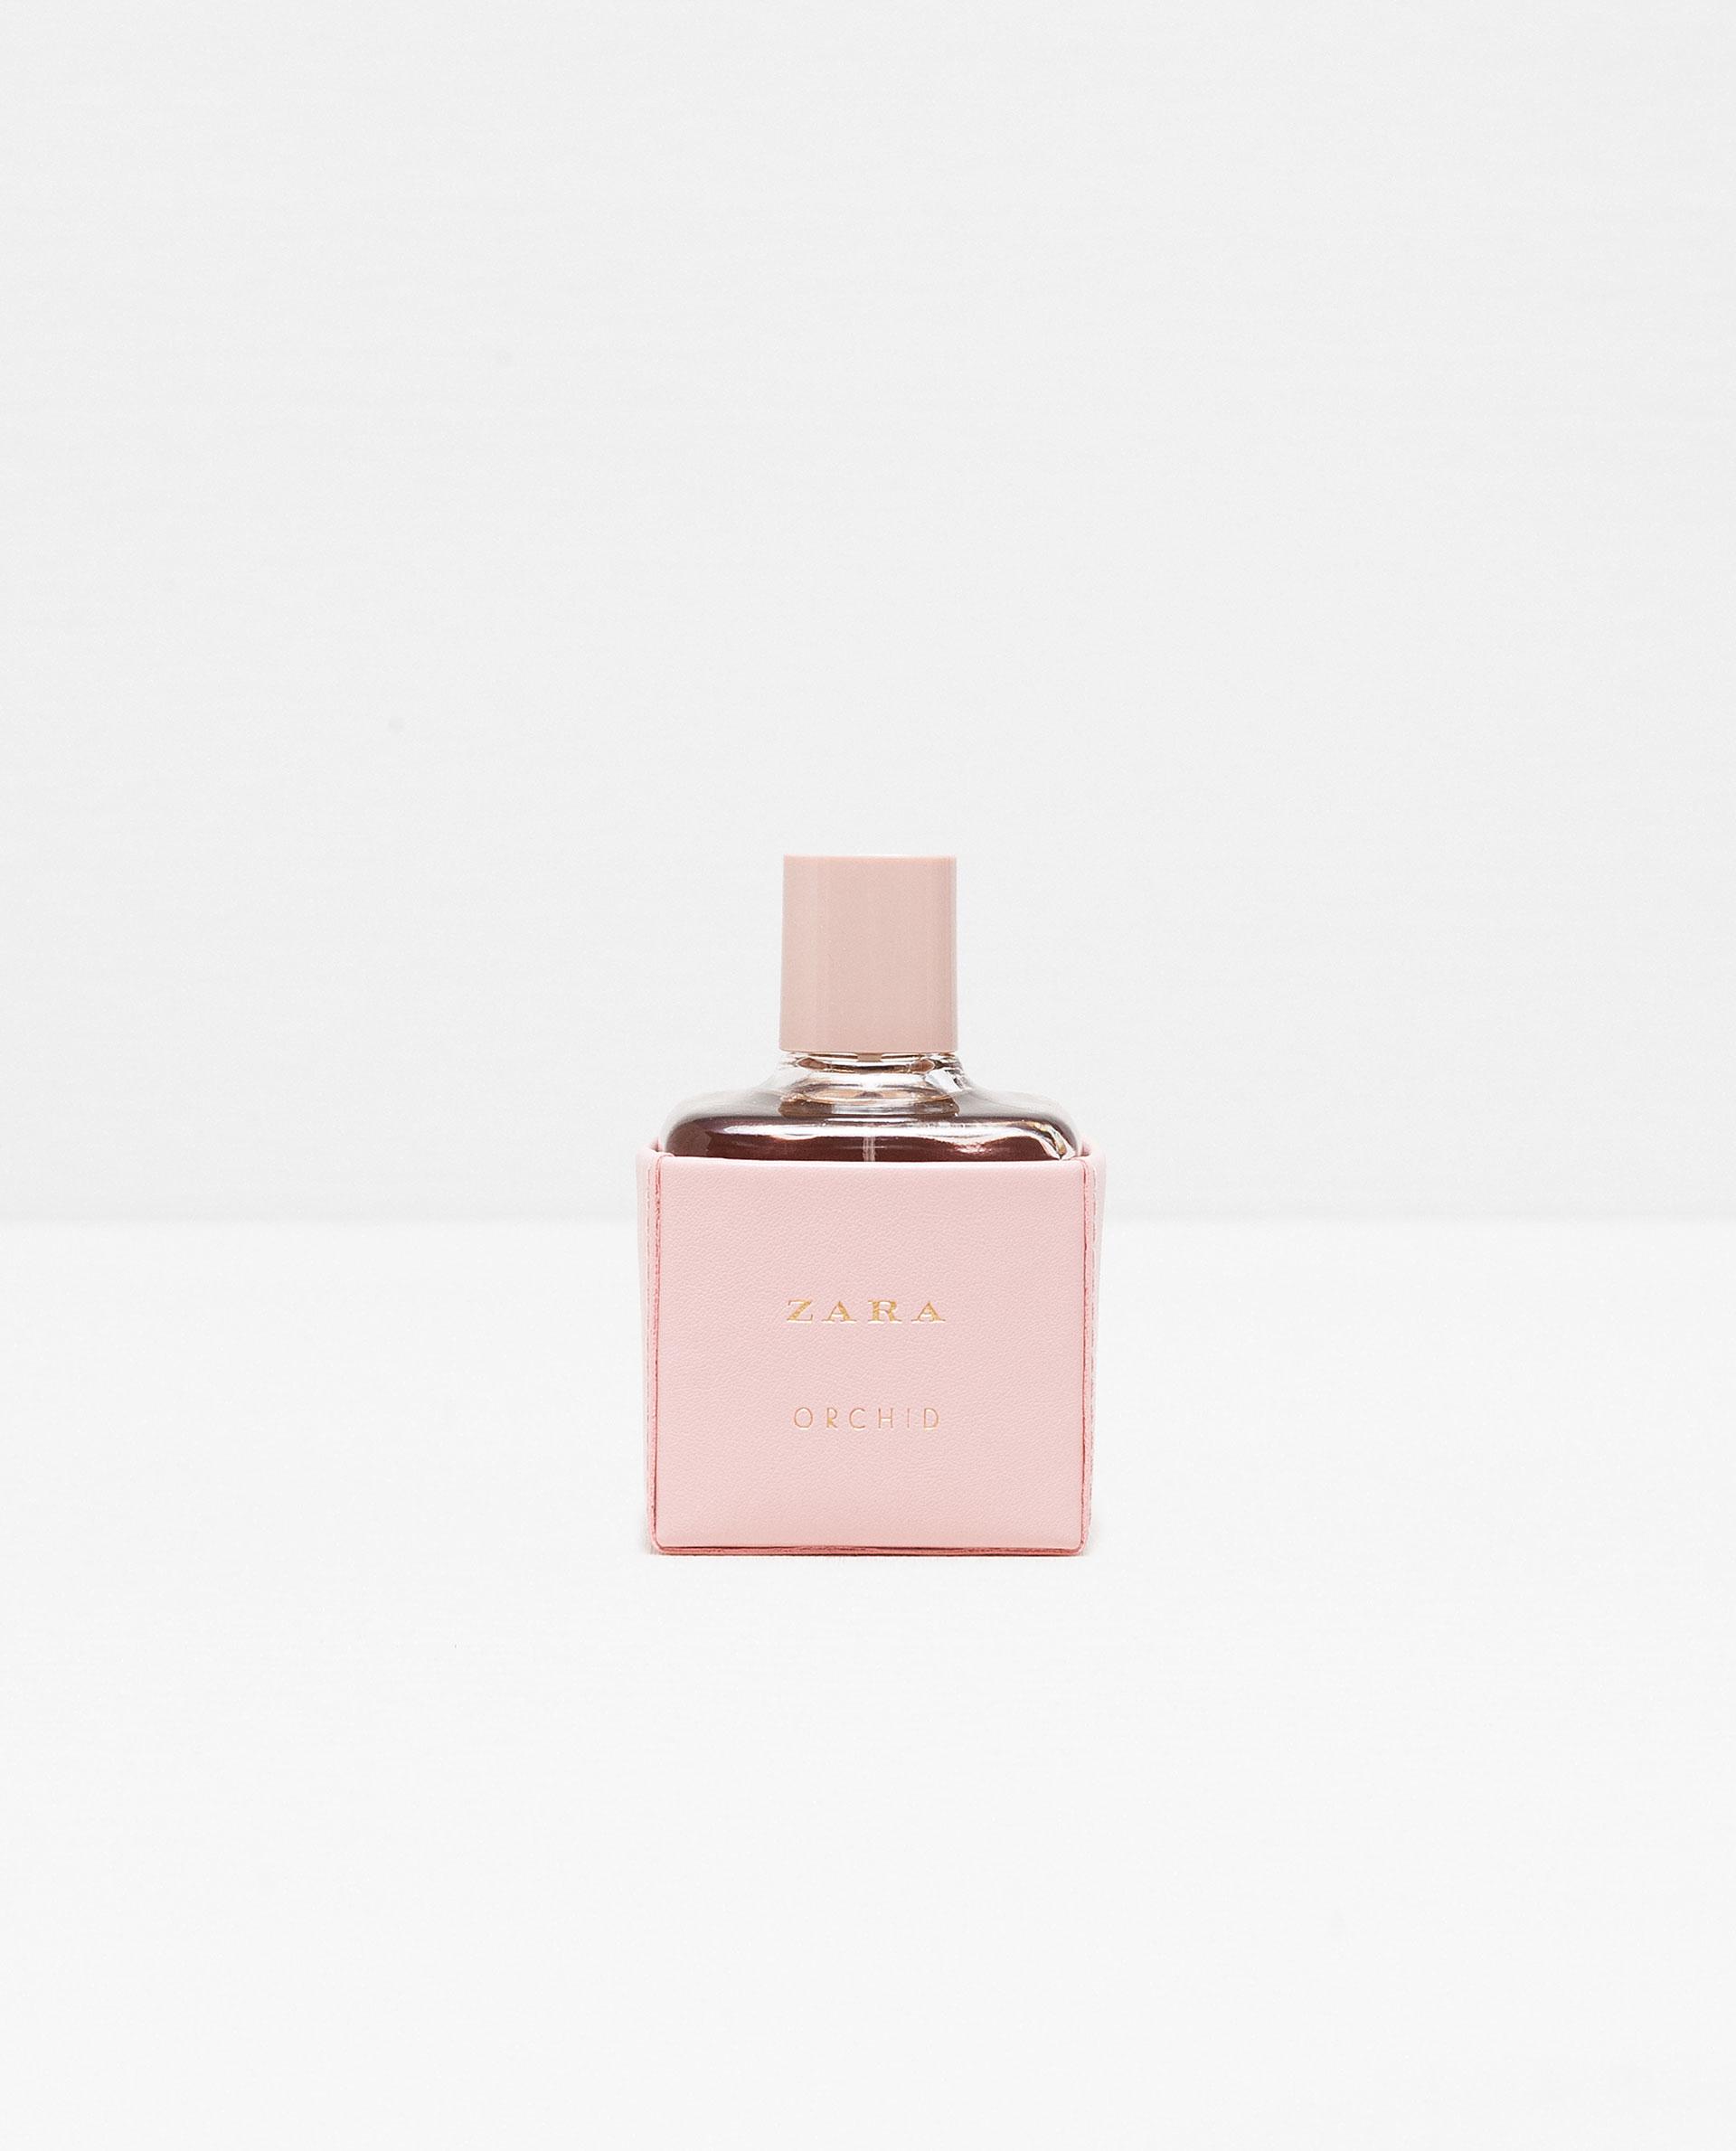 Zara Orchid 2016 Zara for women Pictures ...